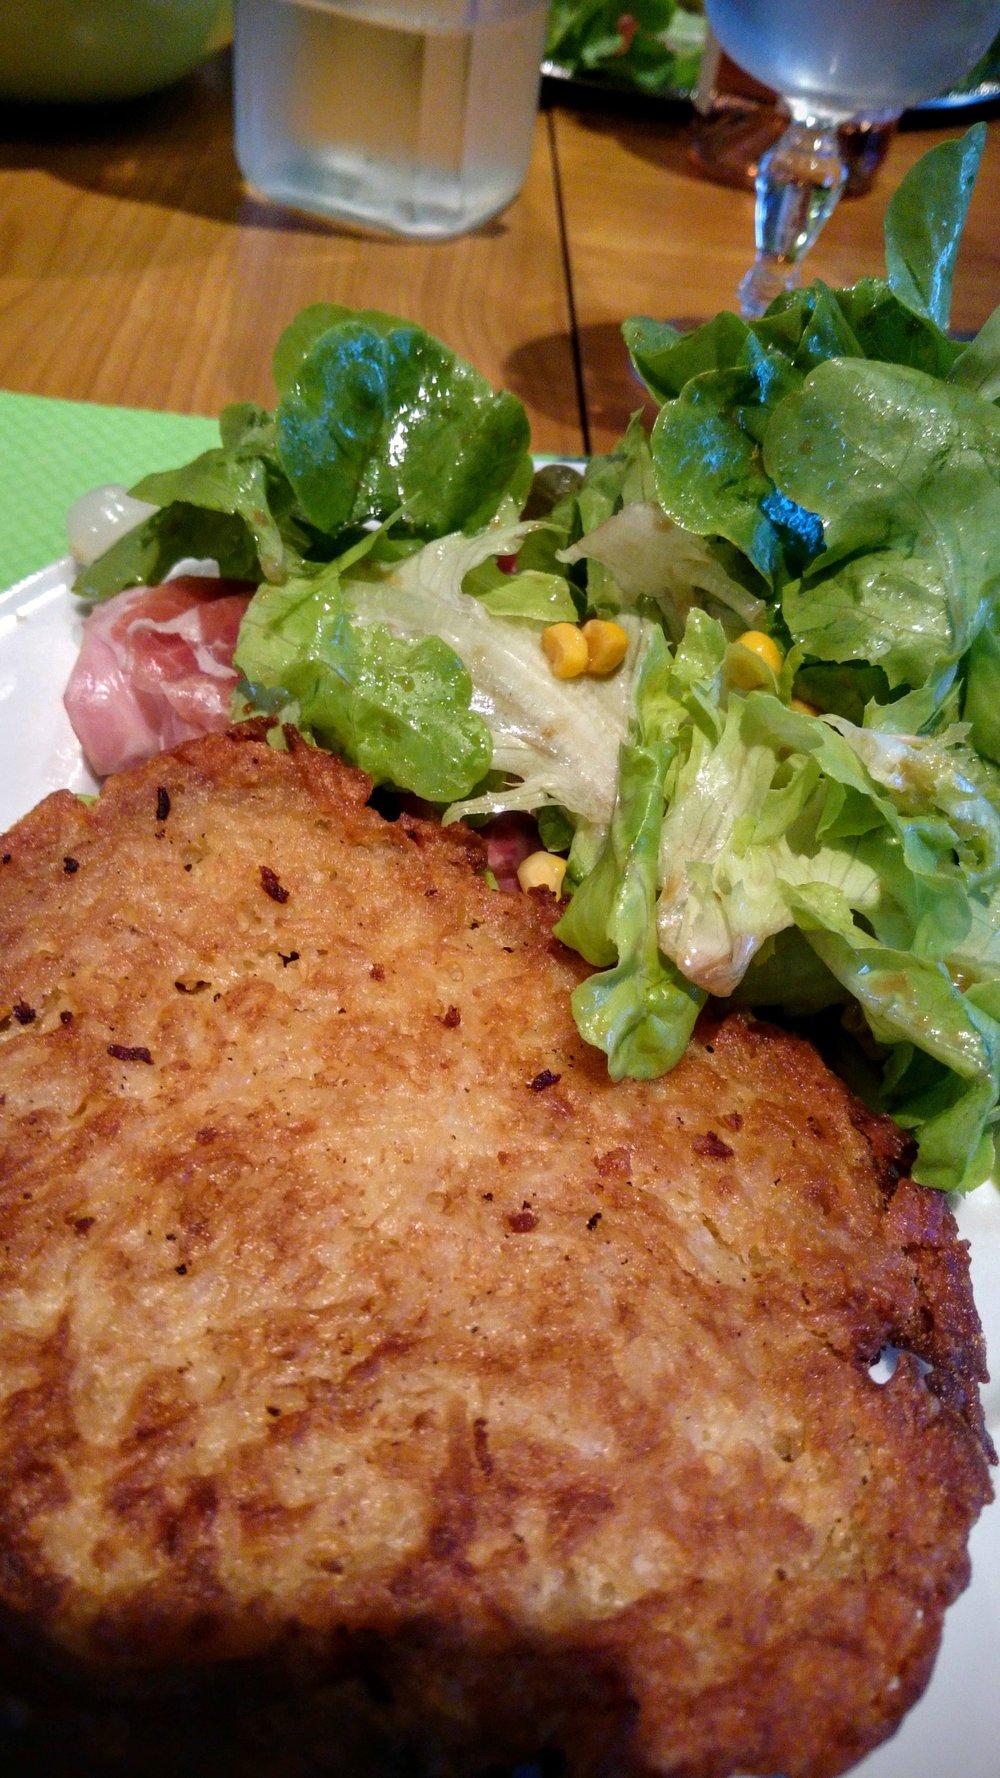 galette-jambon-salade.jpg